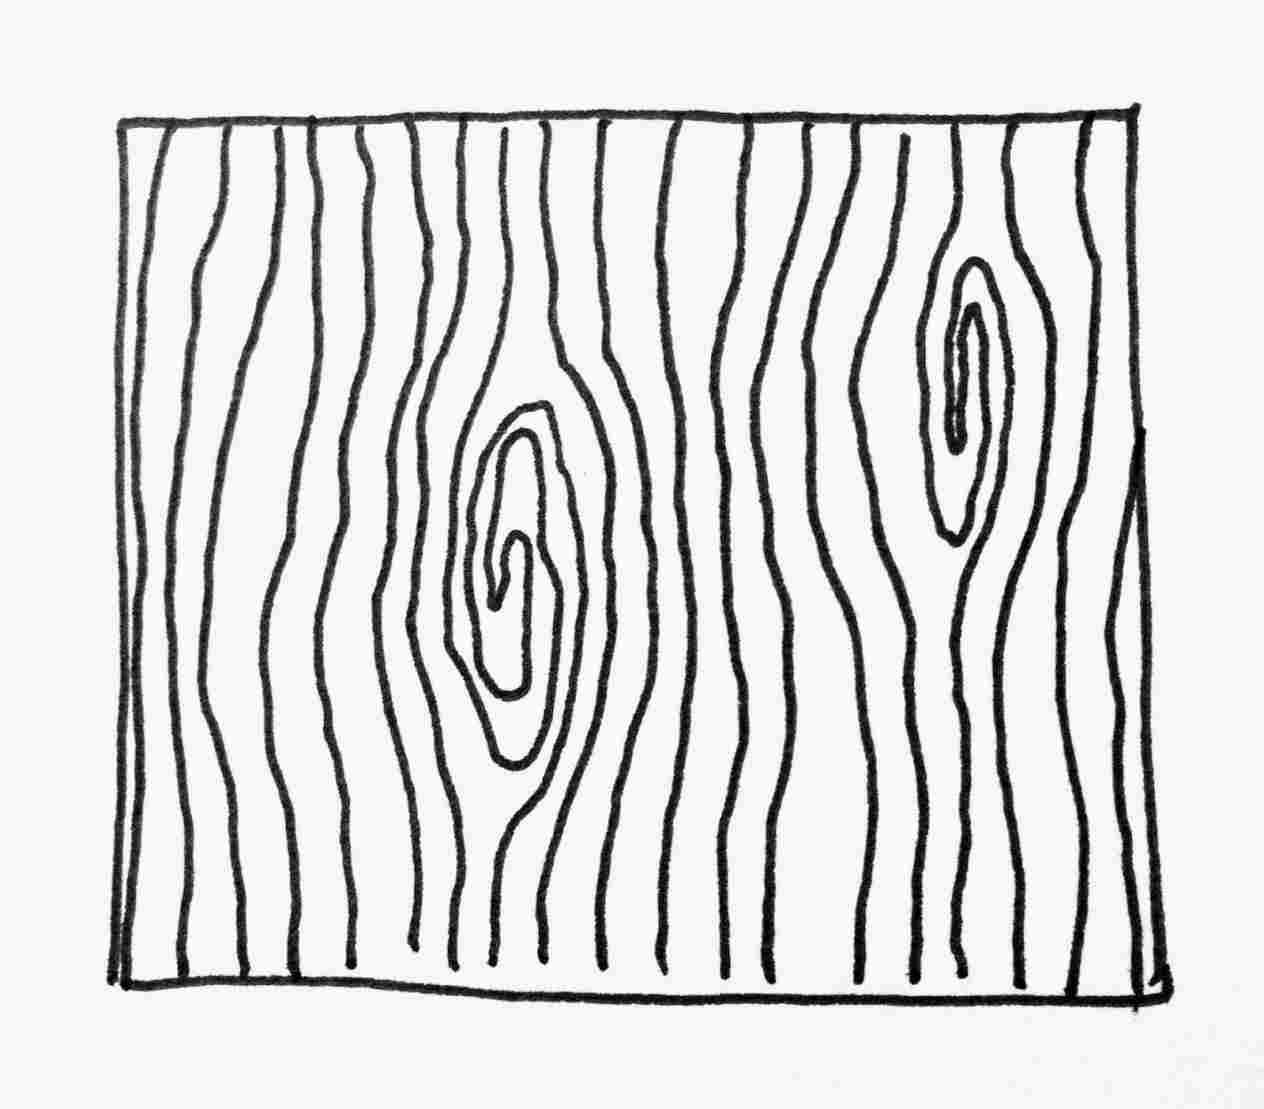 hight resolution of 1264x1109 wood grain grain drawing stock vector royalty free wood grain drawing